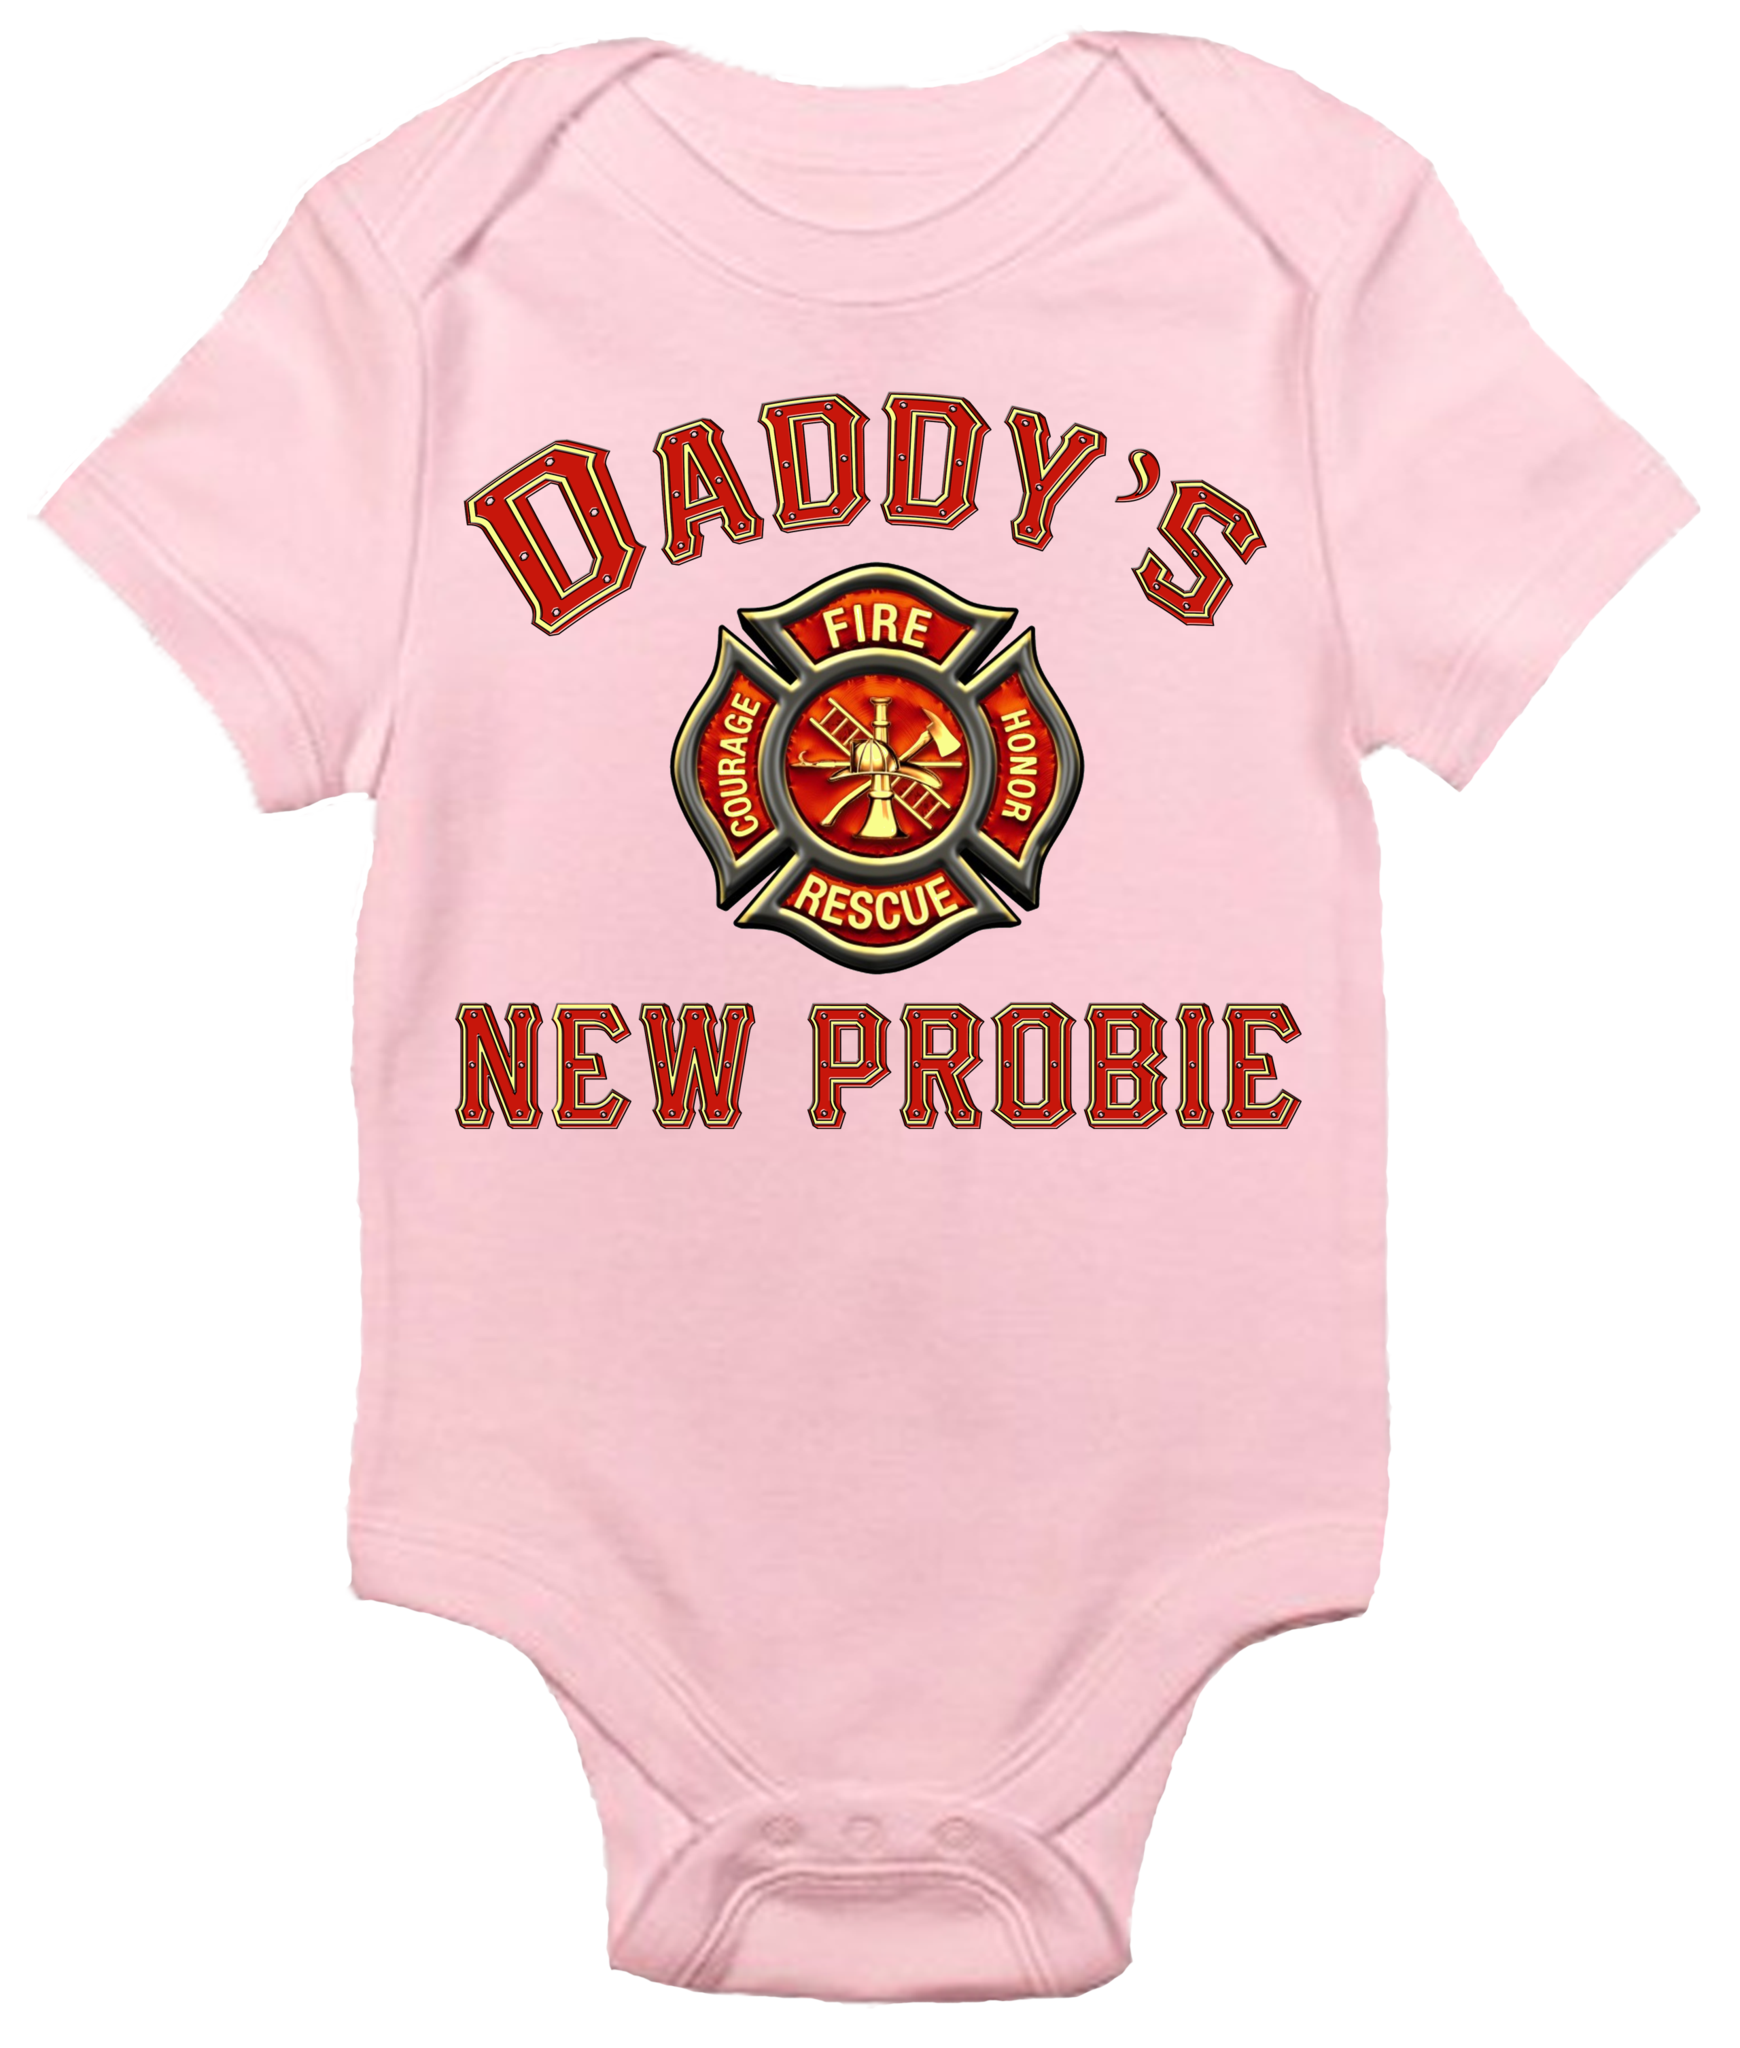 Fire Fighter Fire Romper Novelty Themed Baby Grow Fun FIREMAN FUTURE